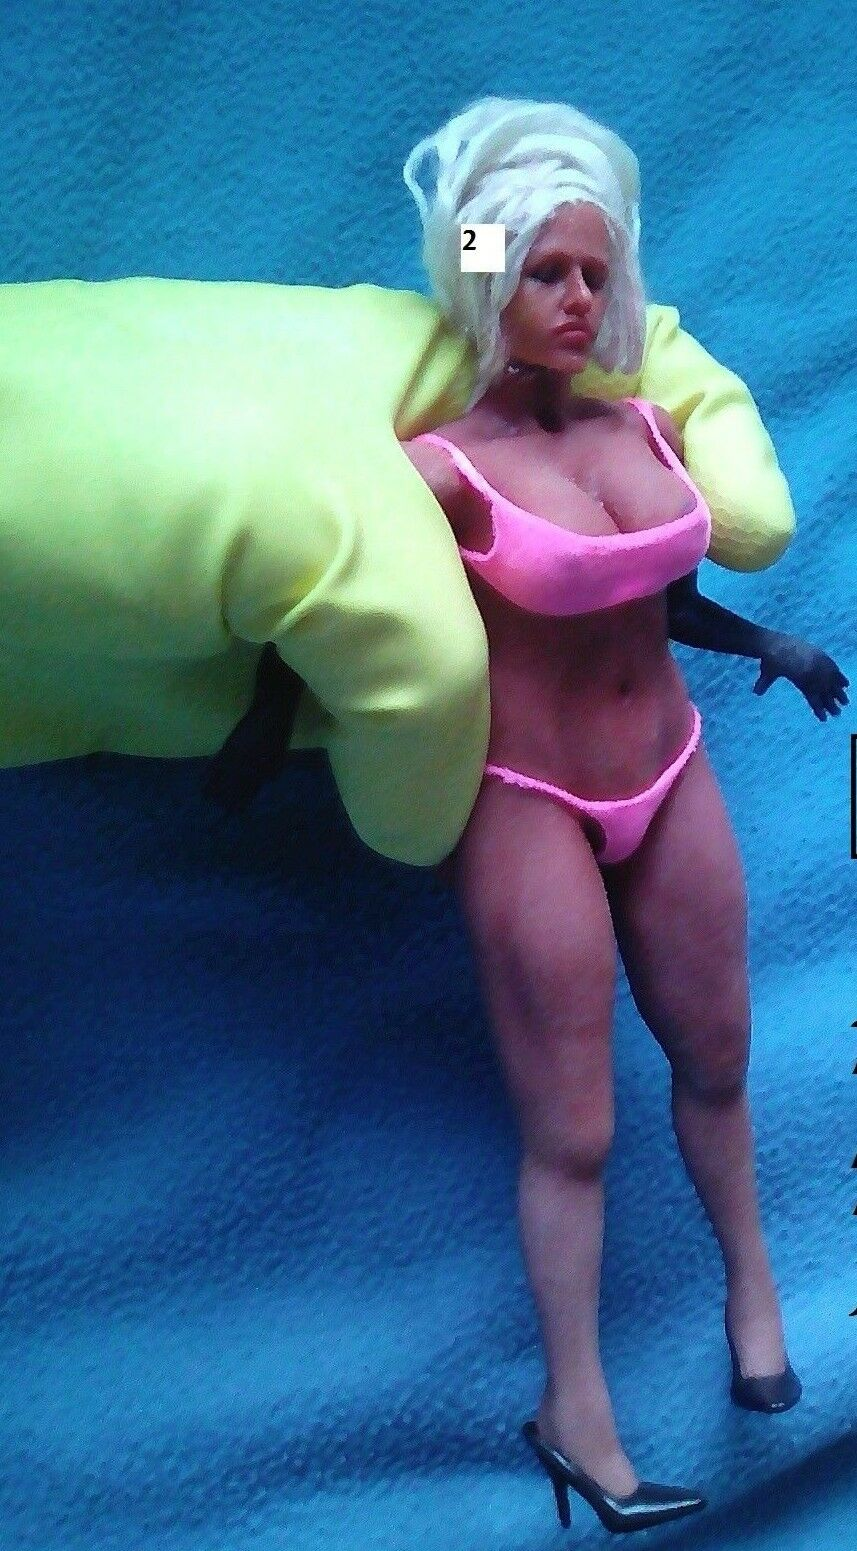 Timesurf Action Figure+ Head (Kim) Seamless Silicone Sexy Figure Anime Hentai